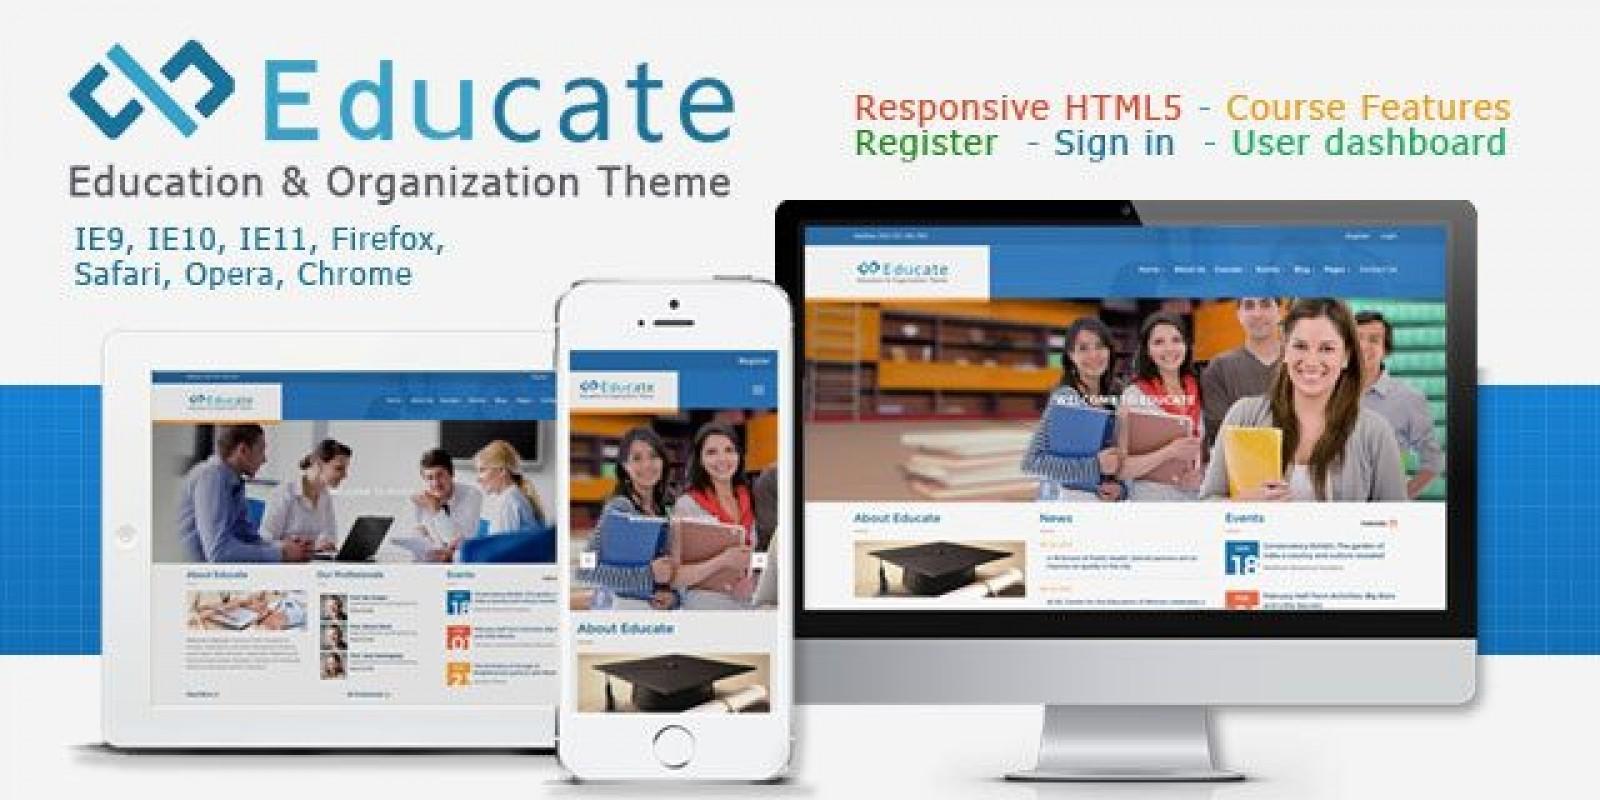 Educate - Responsive HTML5 Template